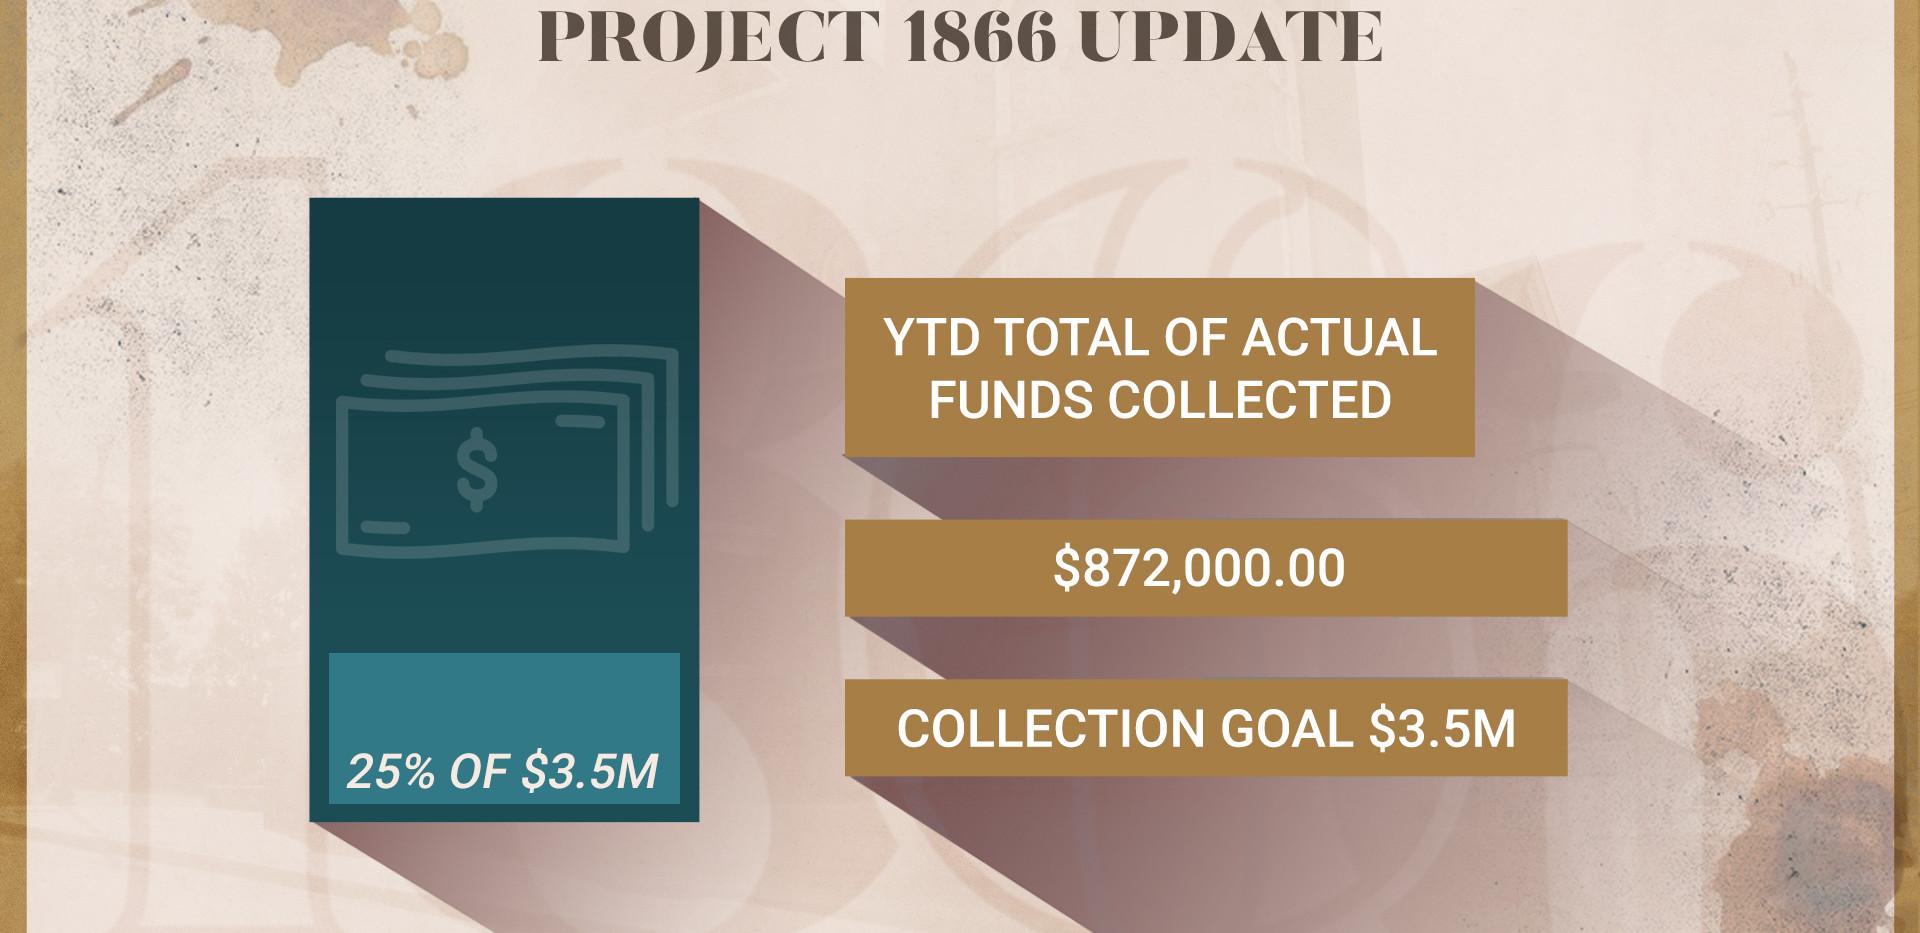 1866_CountDown6_Funds_HD.jpg